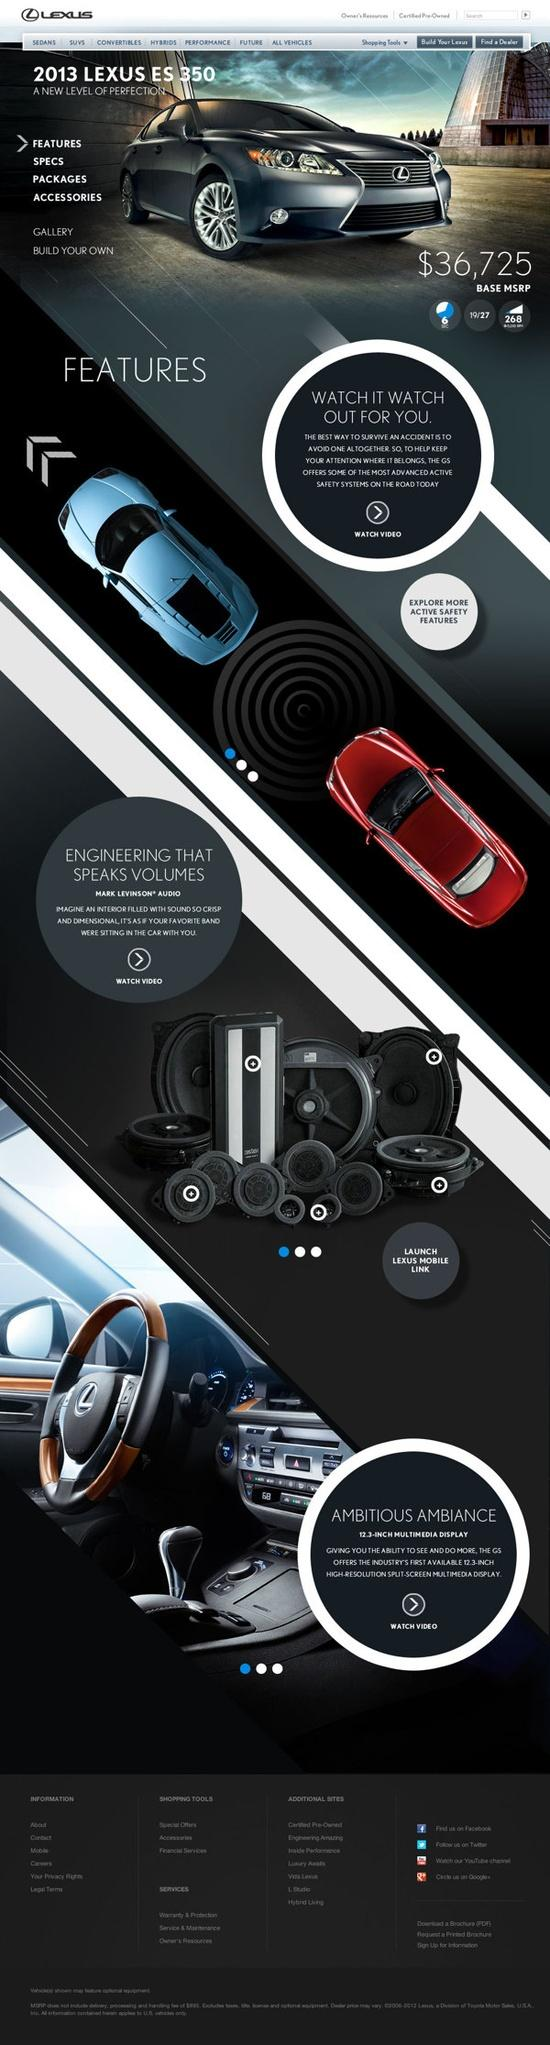 Web Design / Lexus HTML5 Parallax by bil Chamberlin